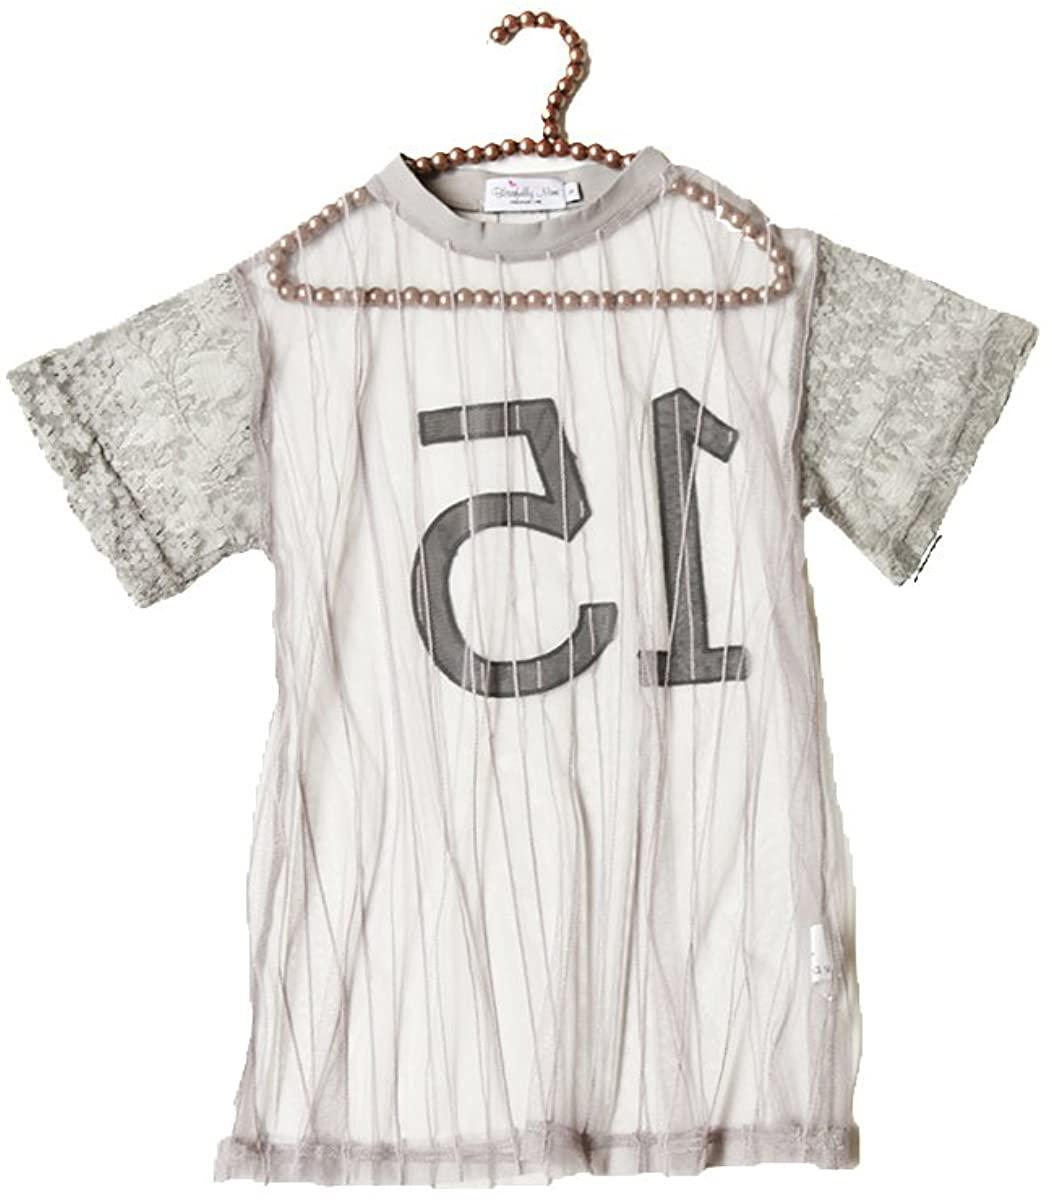 CHOCOKIDS Baseball Fashion Transparent Lace Girls Tops ; Black/Gray BSP0117